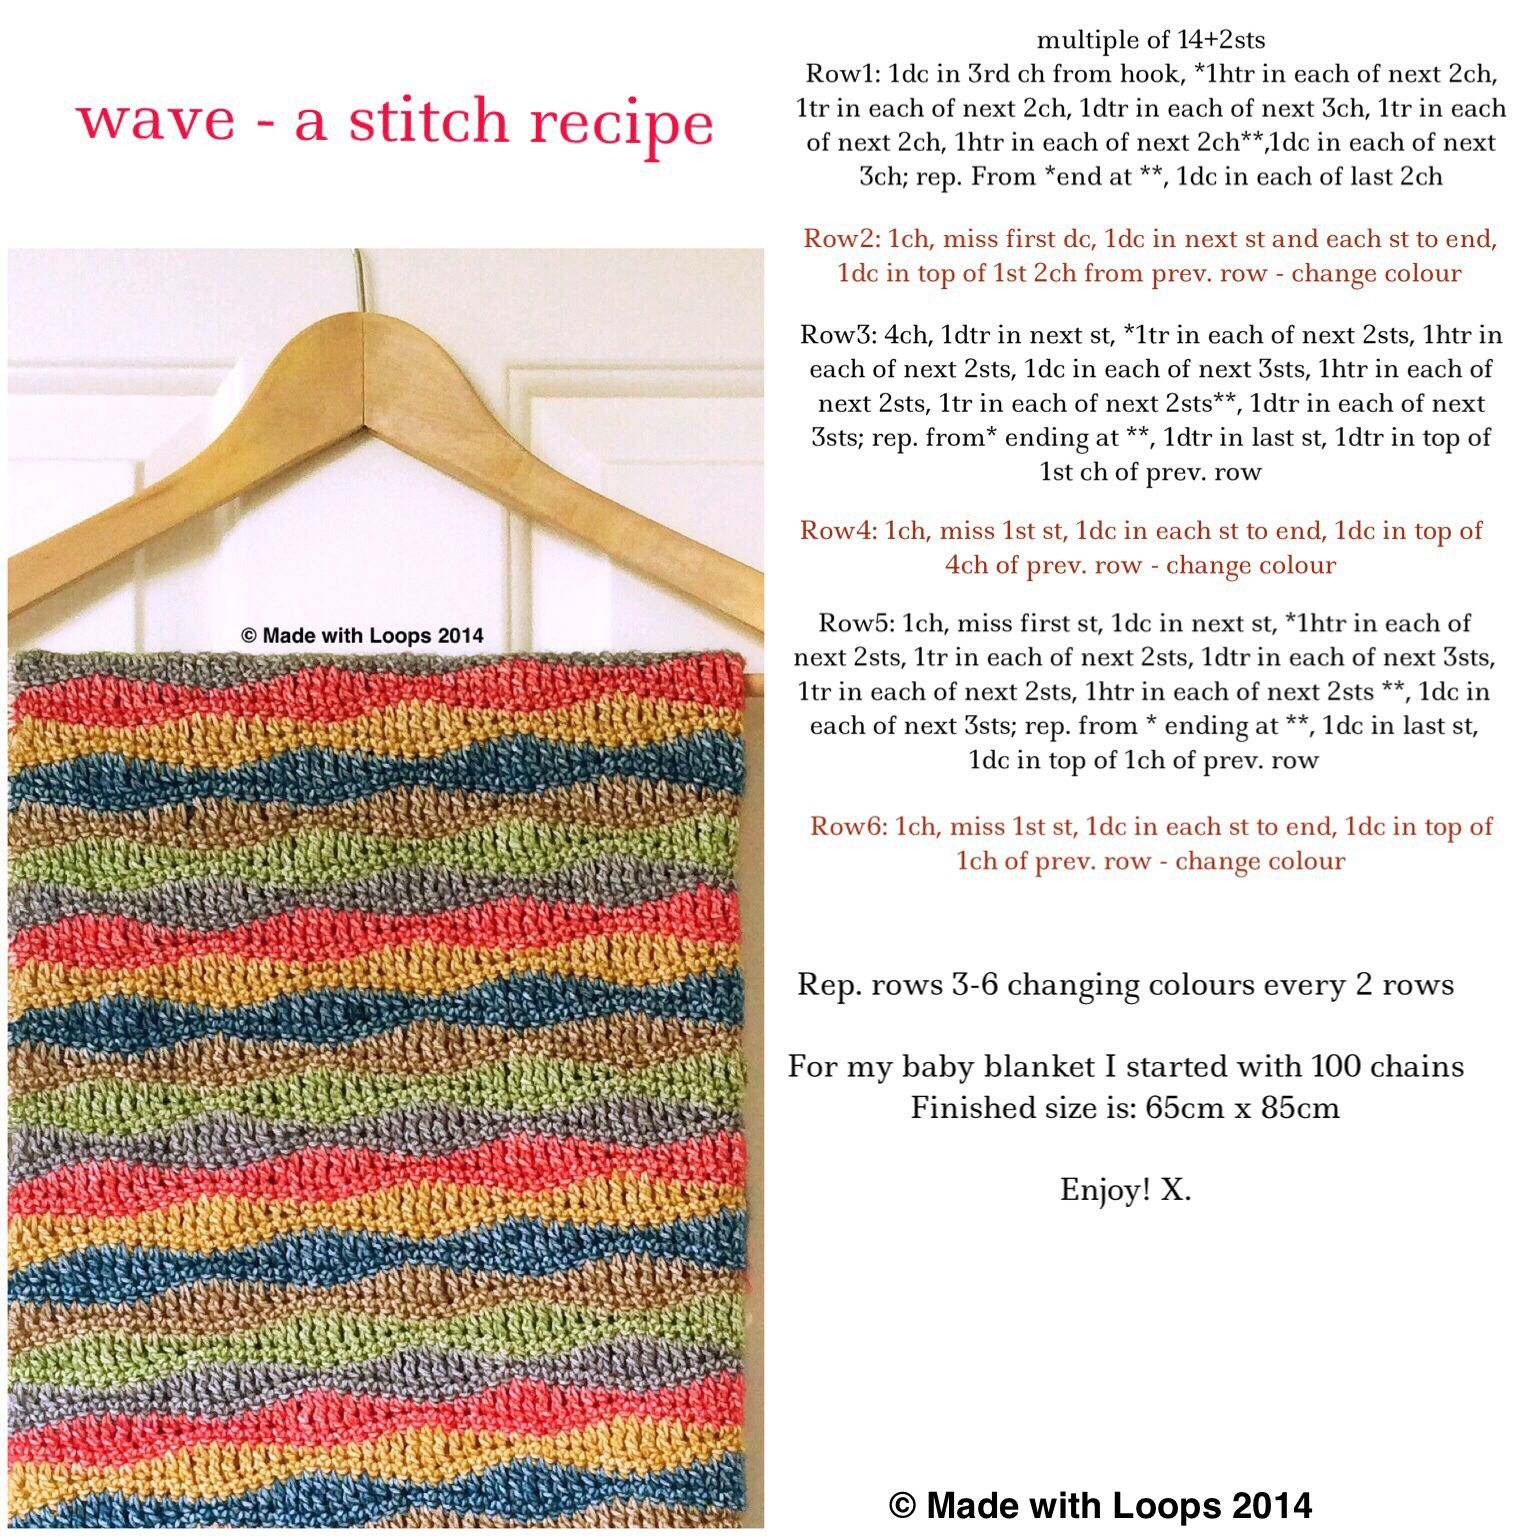 Baby Blanket - Free Pattern at www.madewithloops.co.uk | Crochet ...